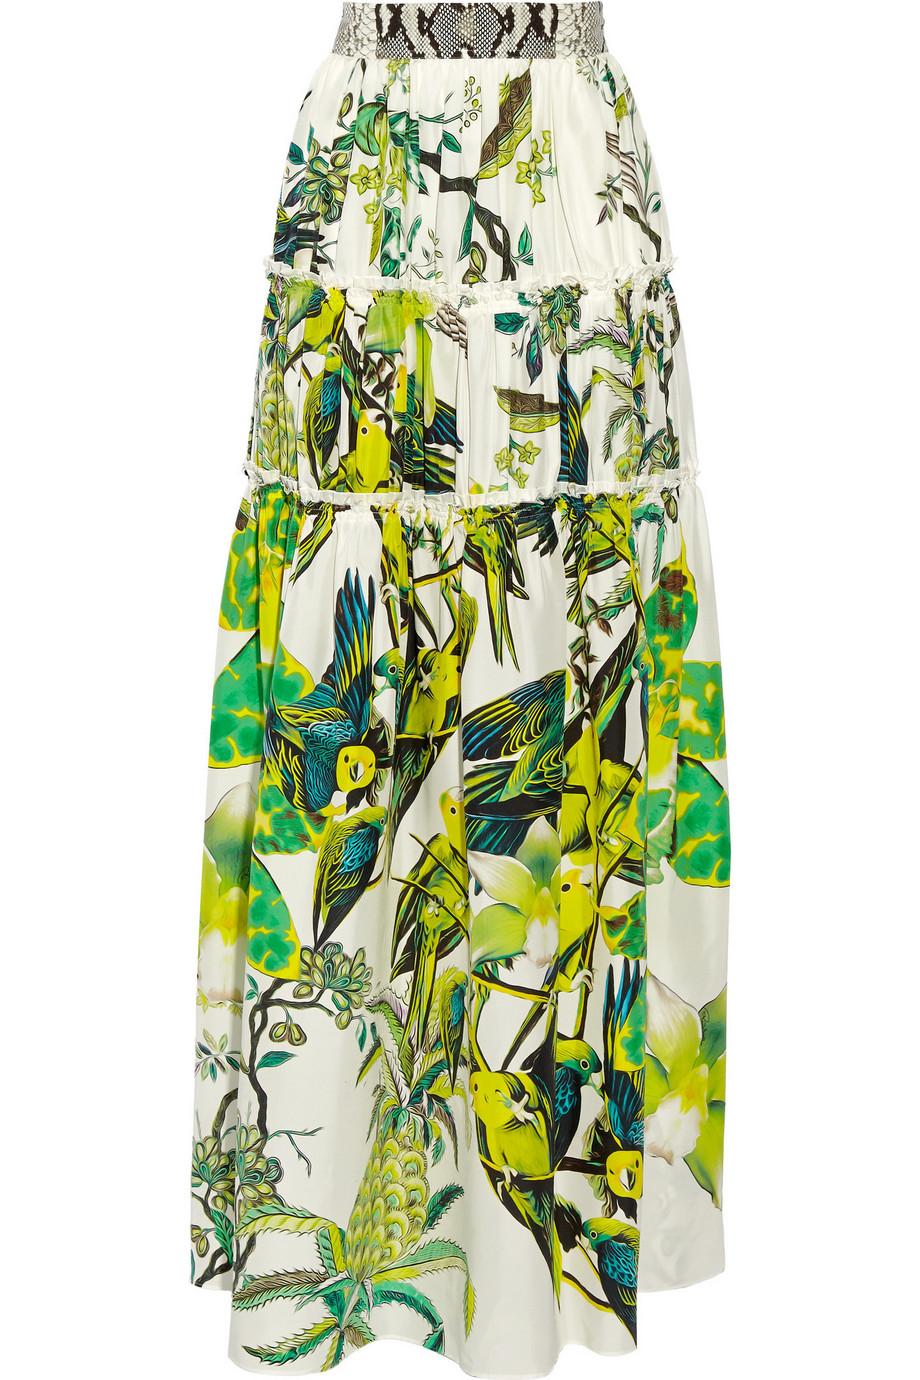 Roberto Cavalli Paneled Printed Silk-Satin Maxi Skirt, Size: 42